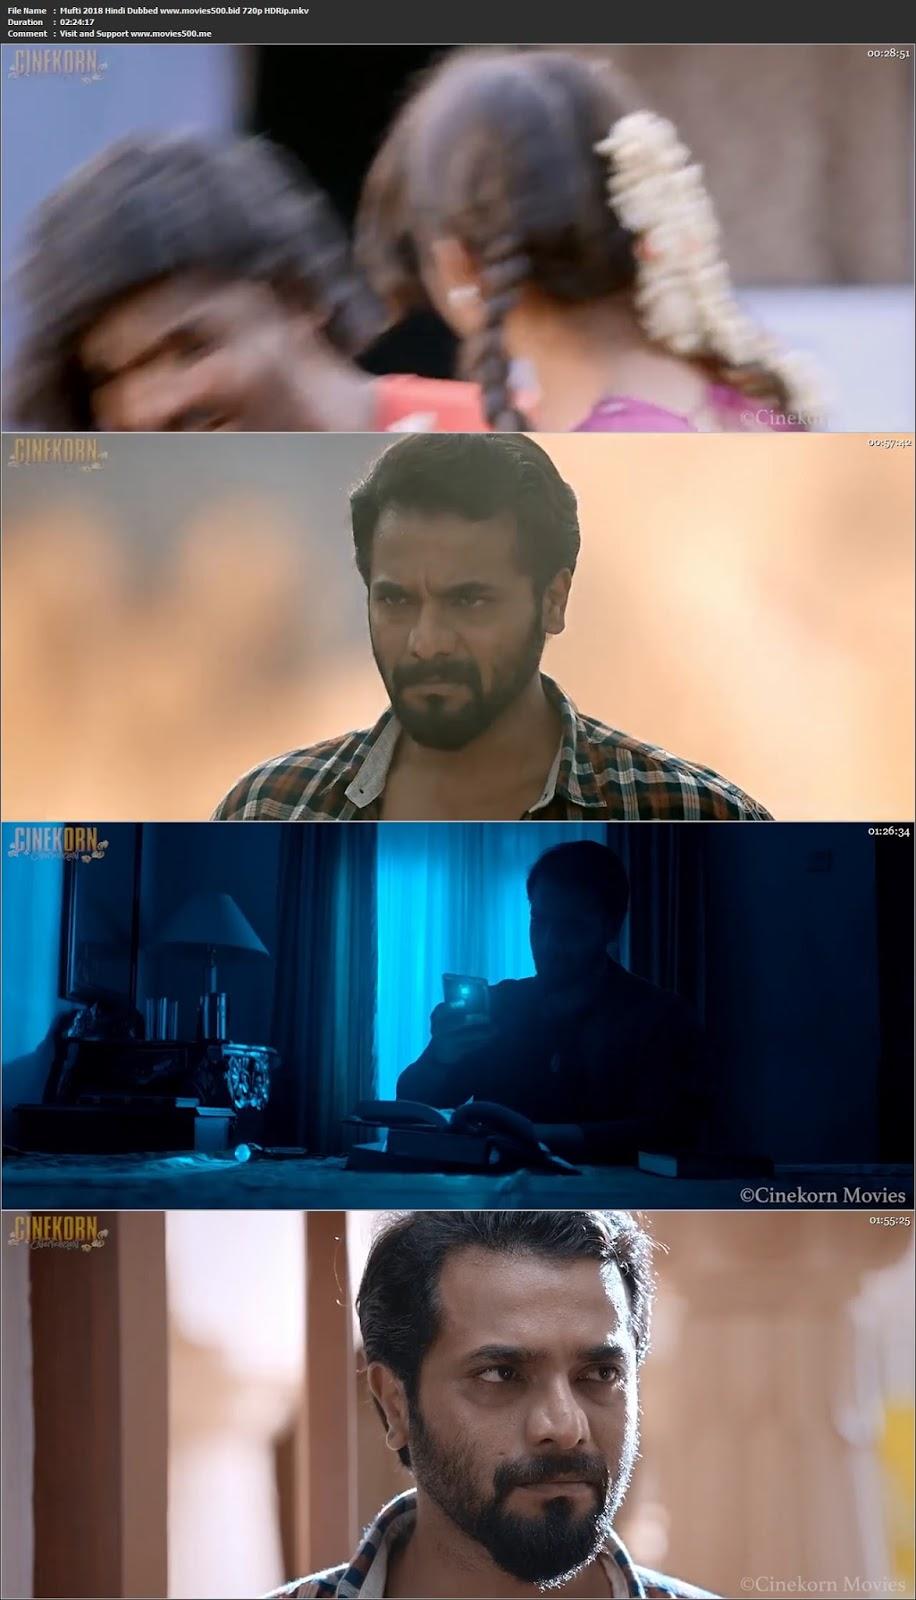 Mufti 2018 Hindi Dubbed Full Movie HDRip 720p at gencoalumni.info